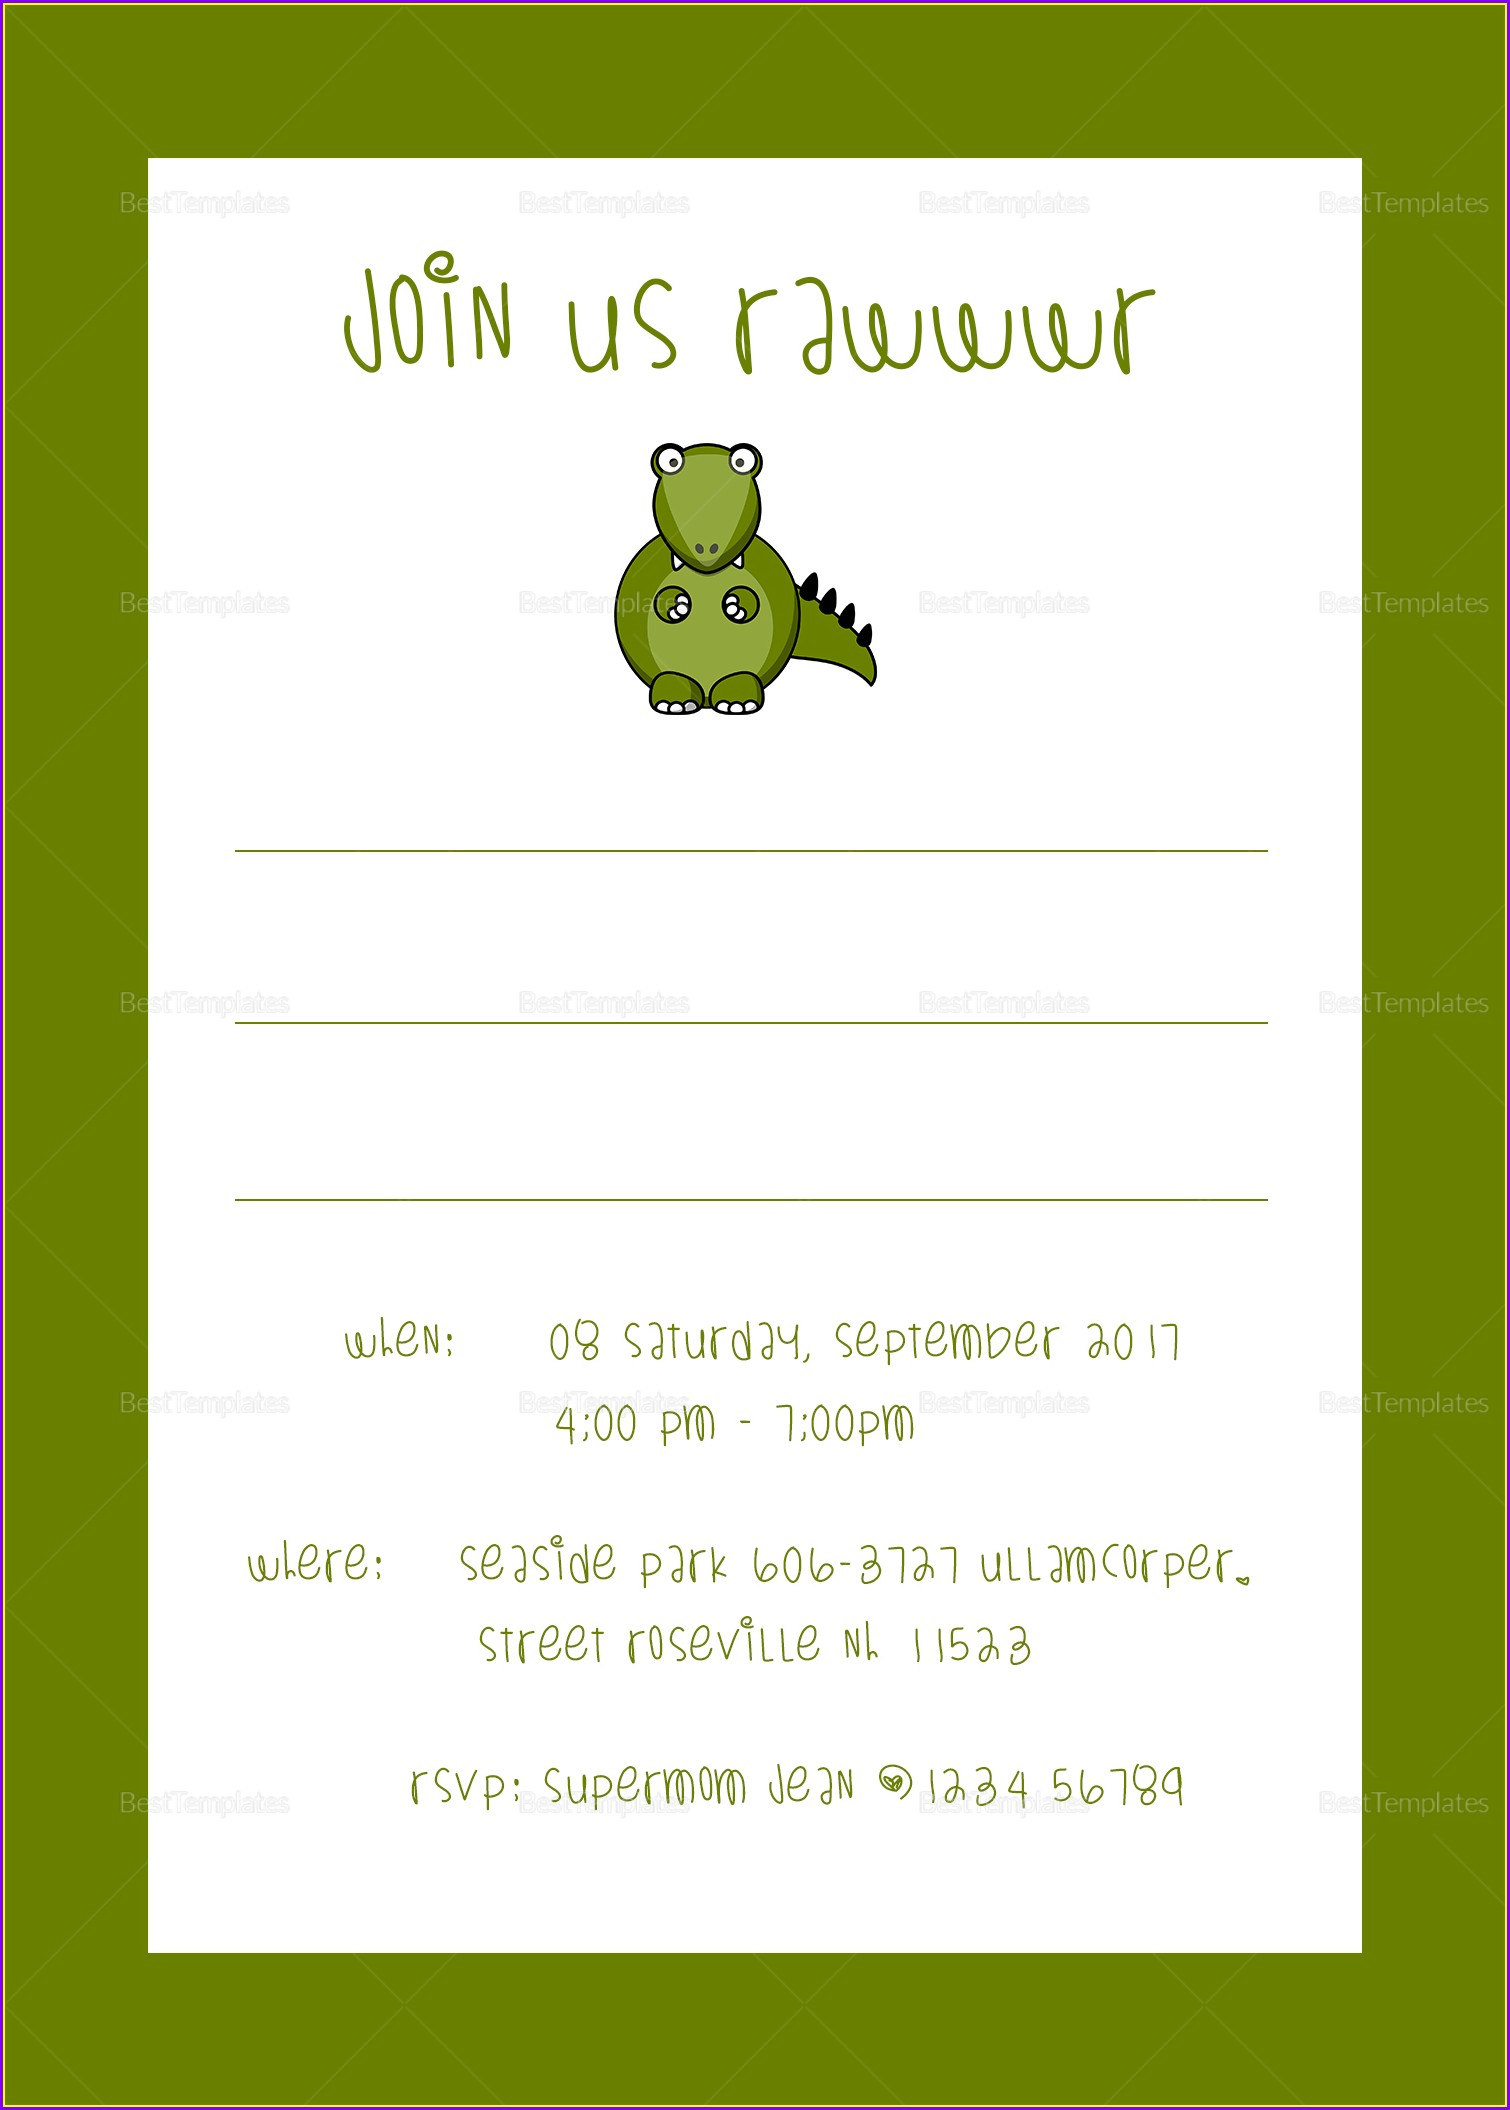 Dinosaur Birthday Party Invitation Template